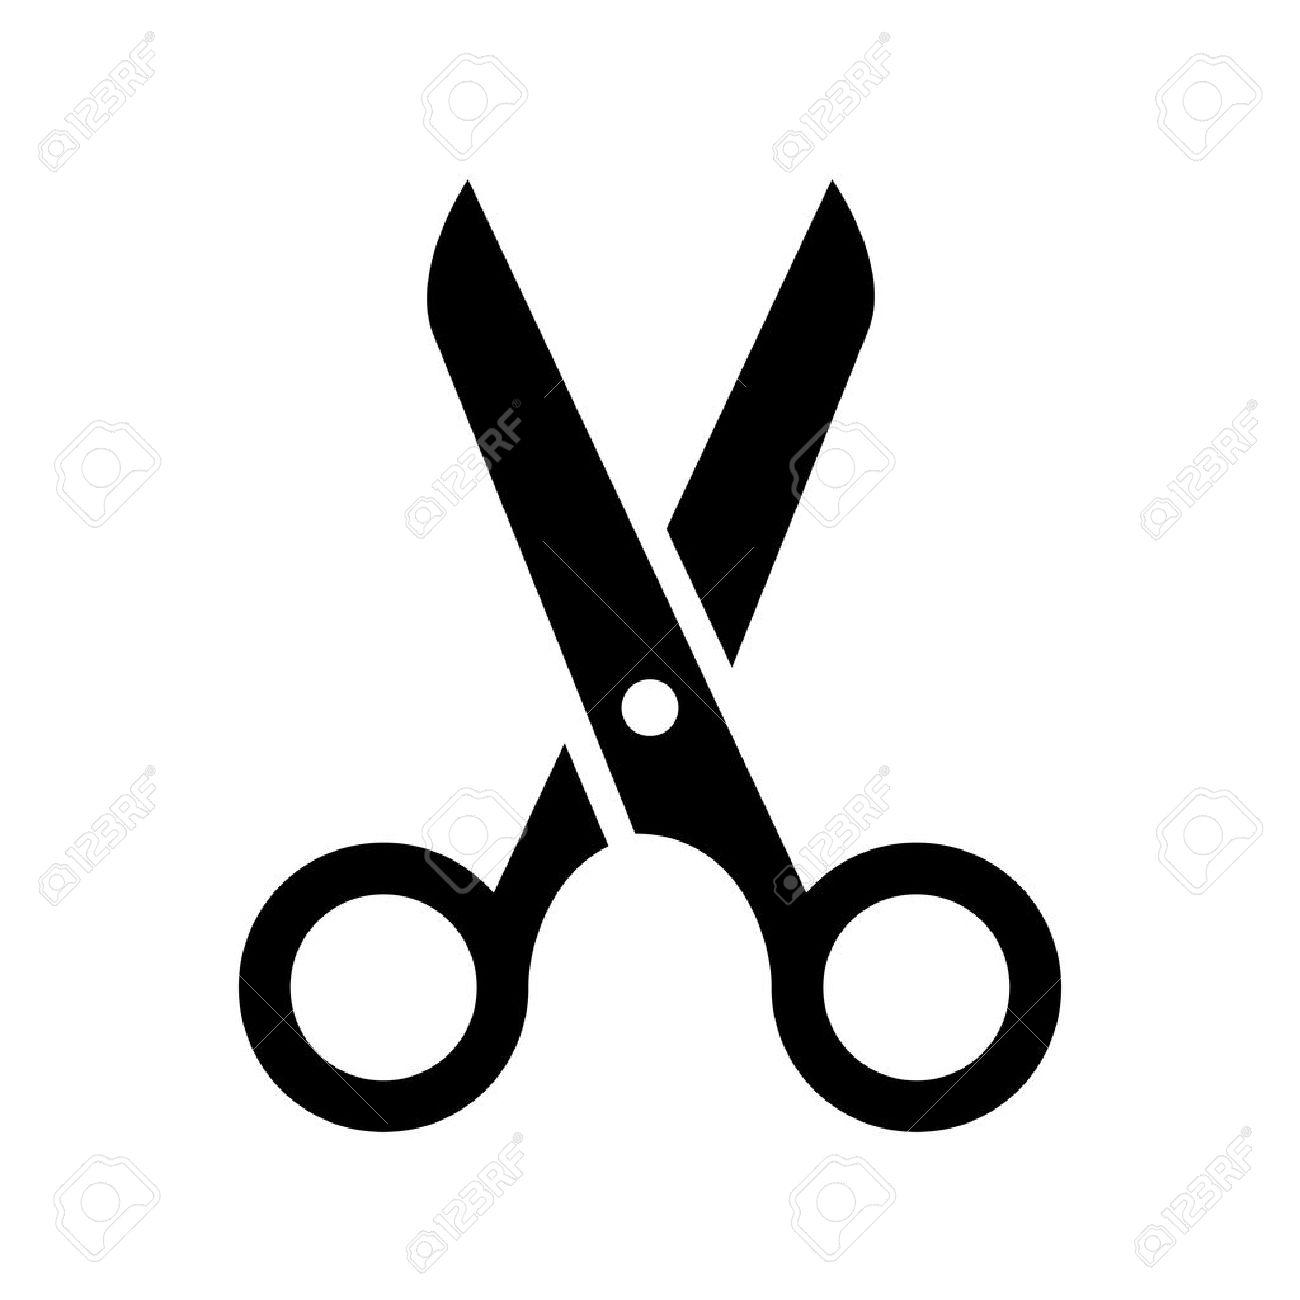 1300x1300 Isolated Scissors Clipart, Explore Pictures